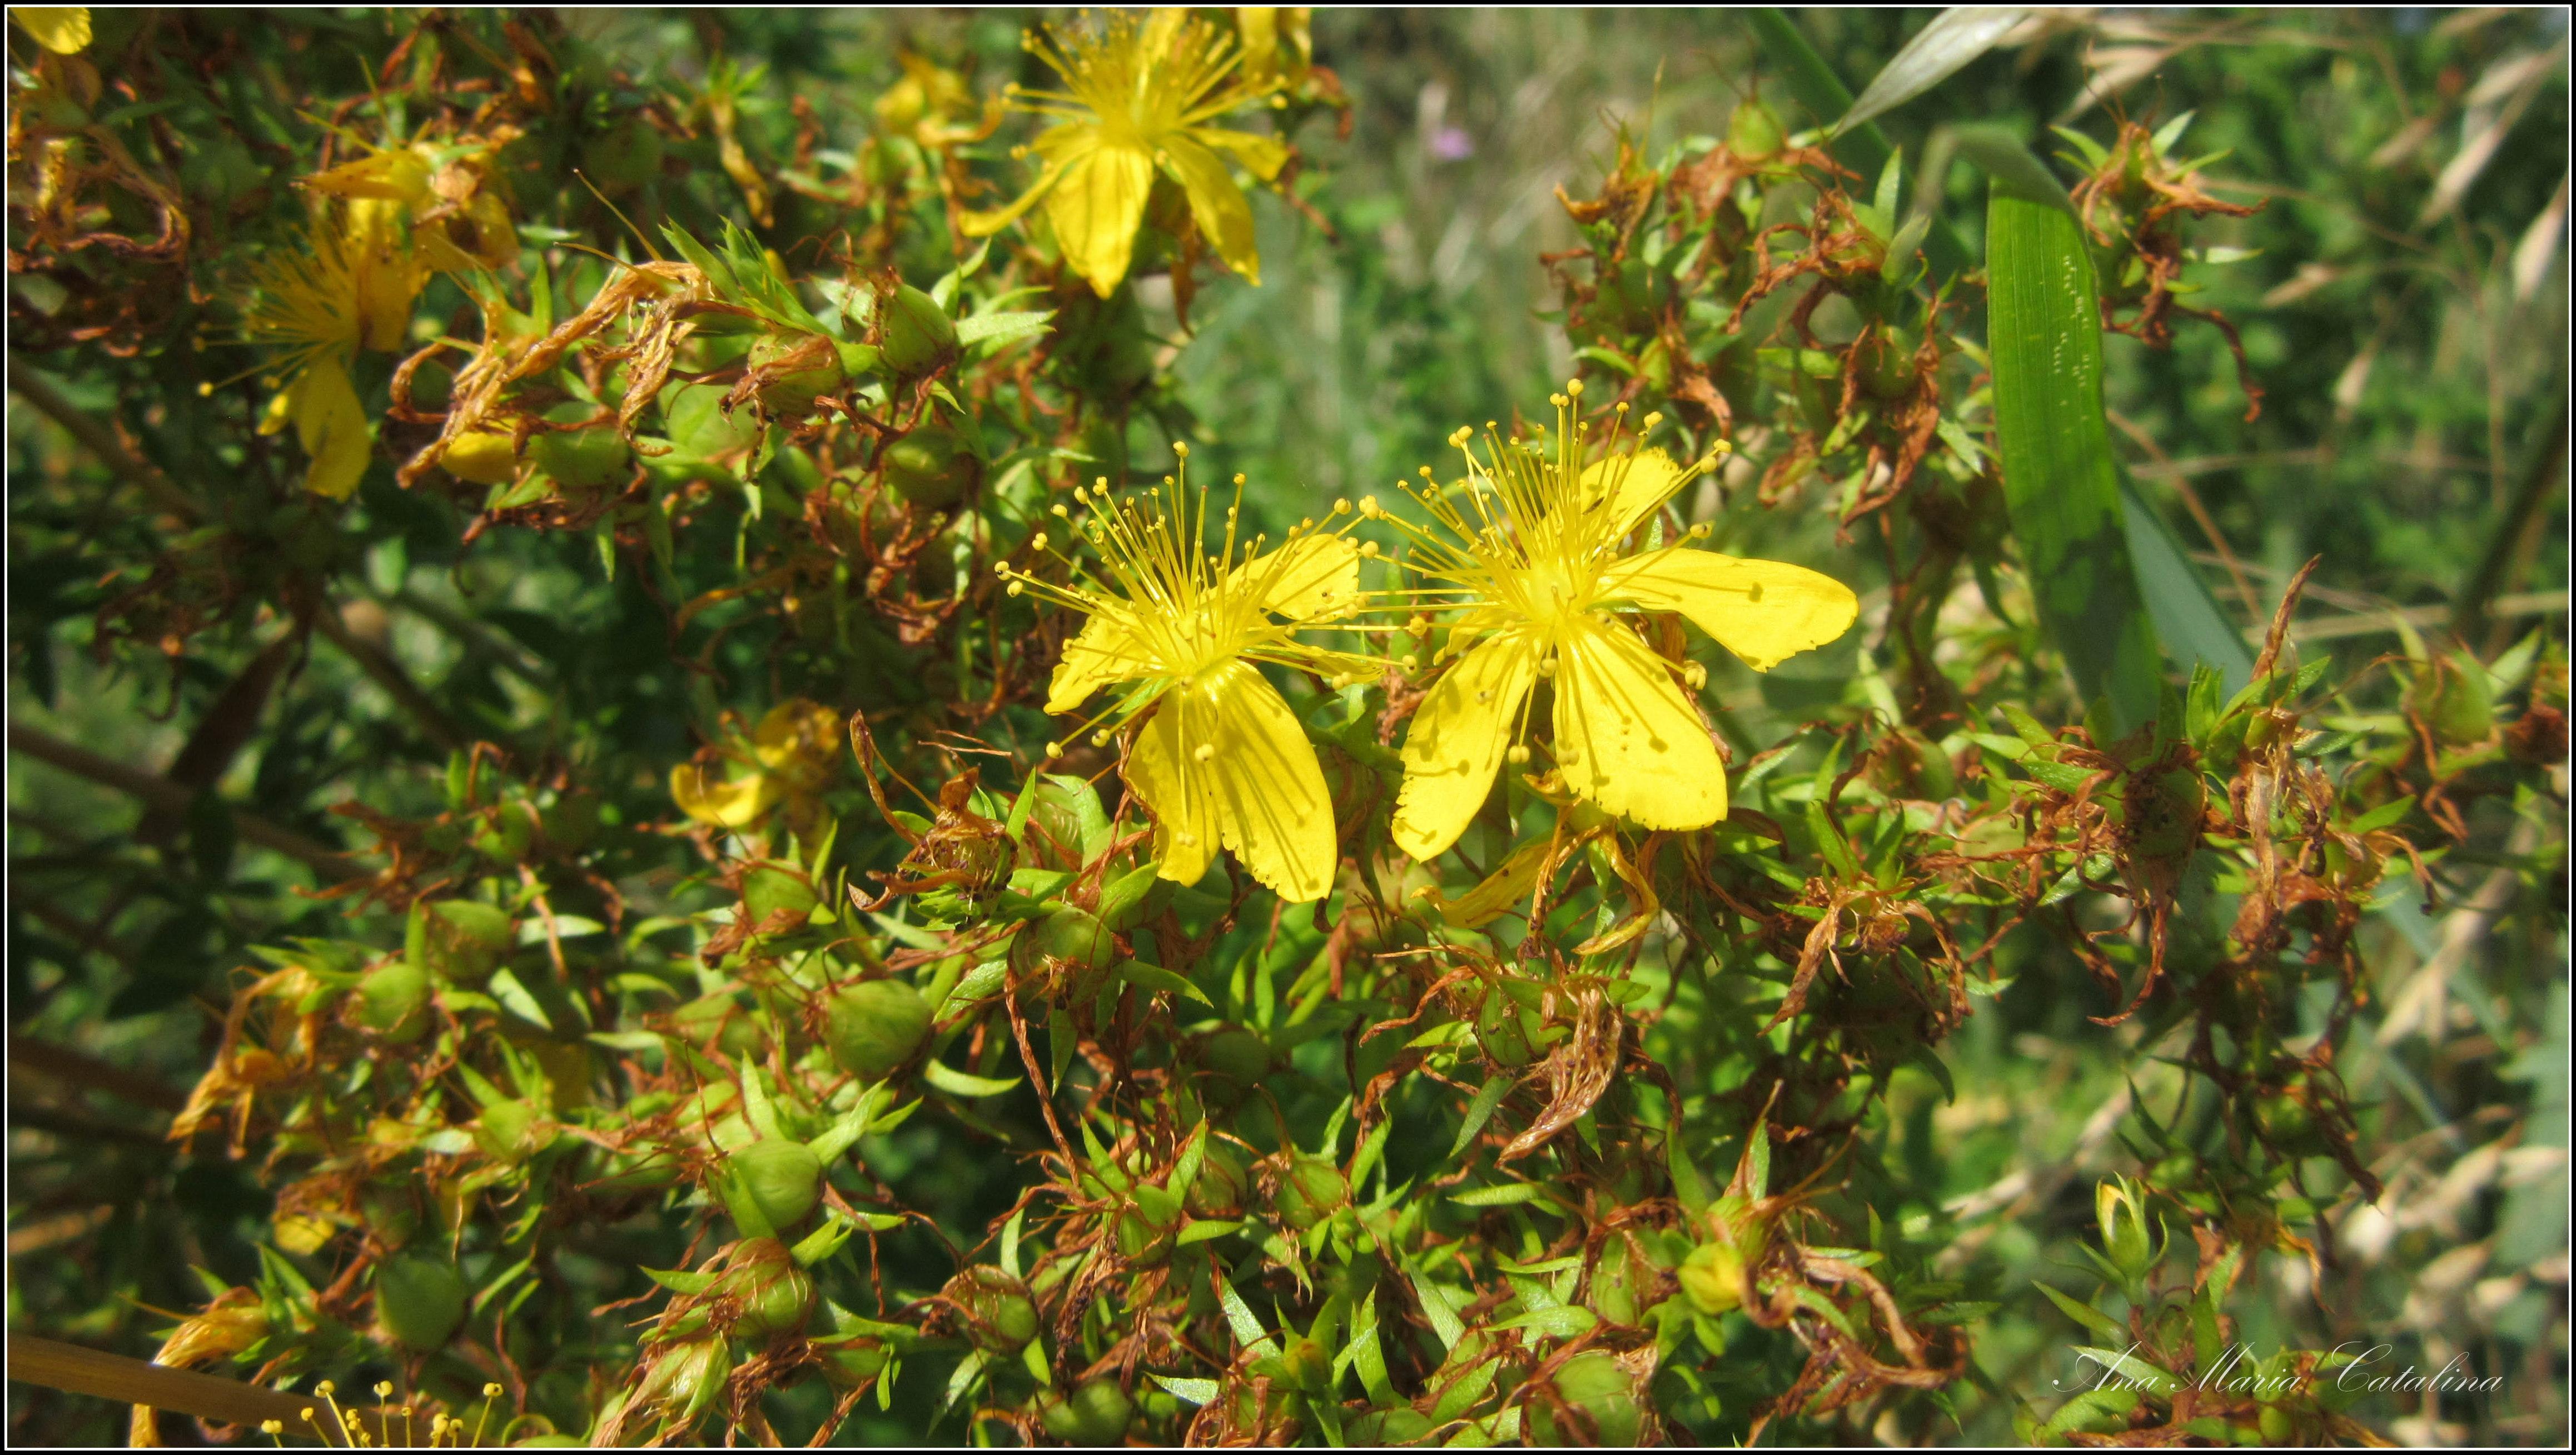 Photo: Sunătoare (Hypericum perforatum) - din zona Badeni, Cluj - 2016.07.16 album http://ana-maria-catalina.blogspot.ro/2016/07/sunatoare-hypericum-perforatum.html